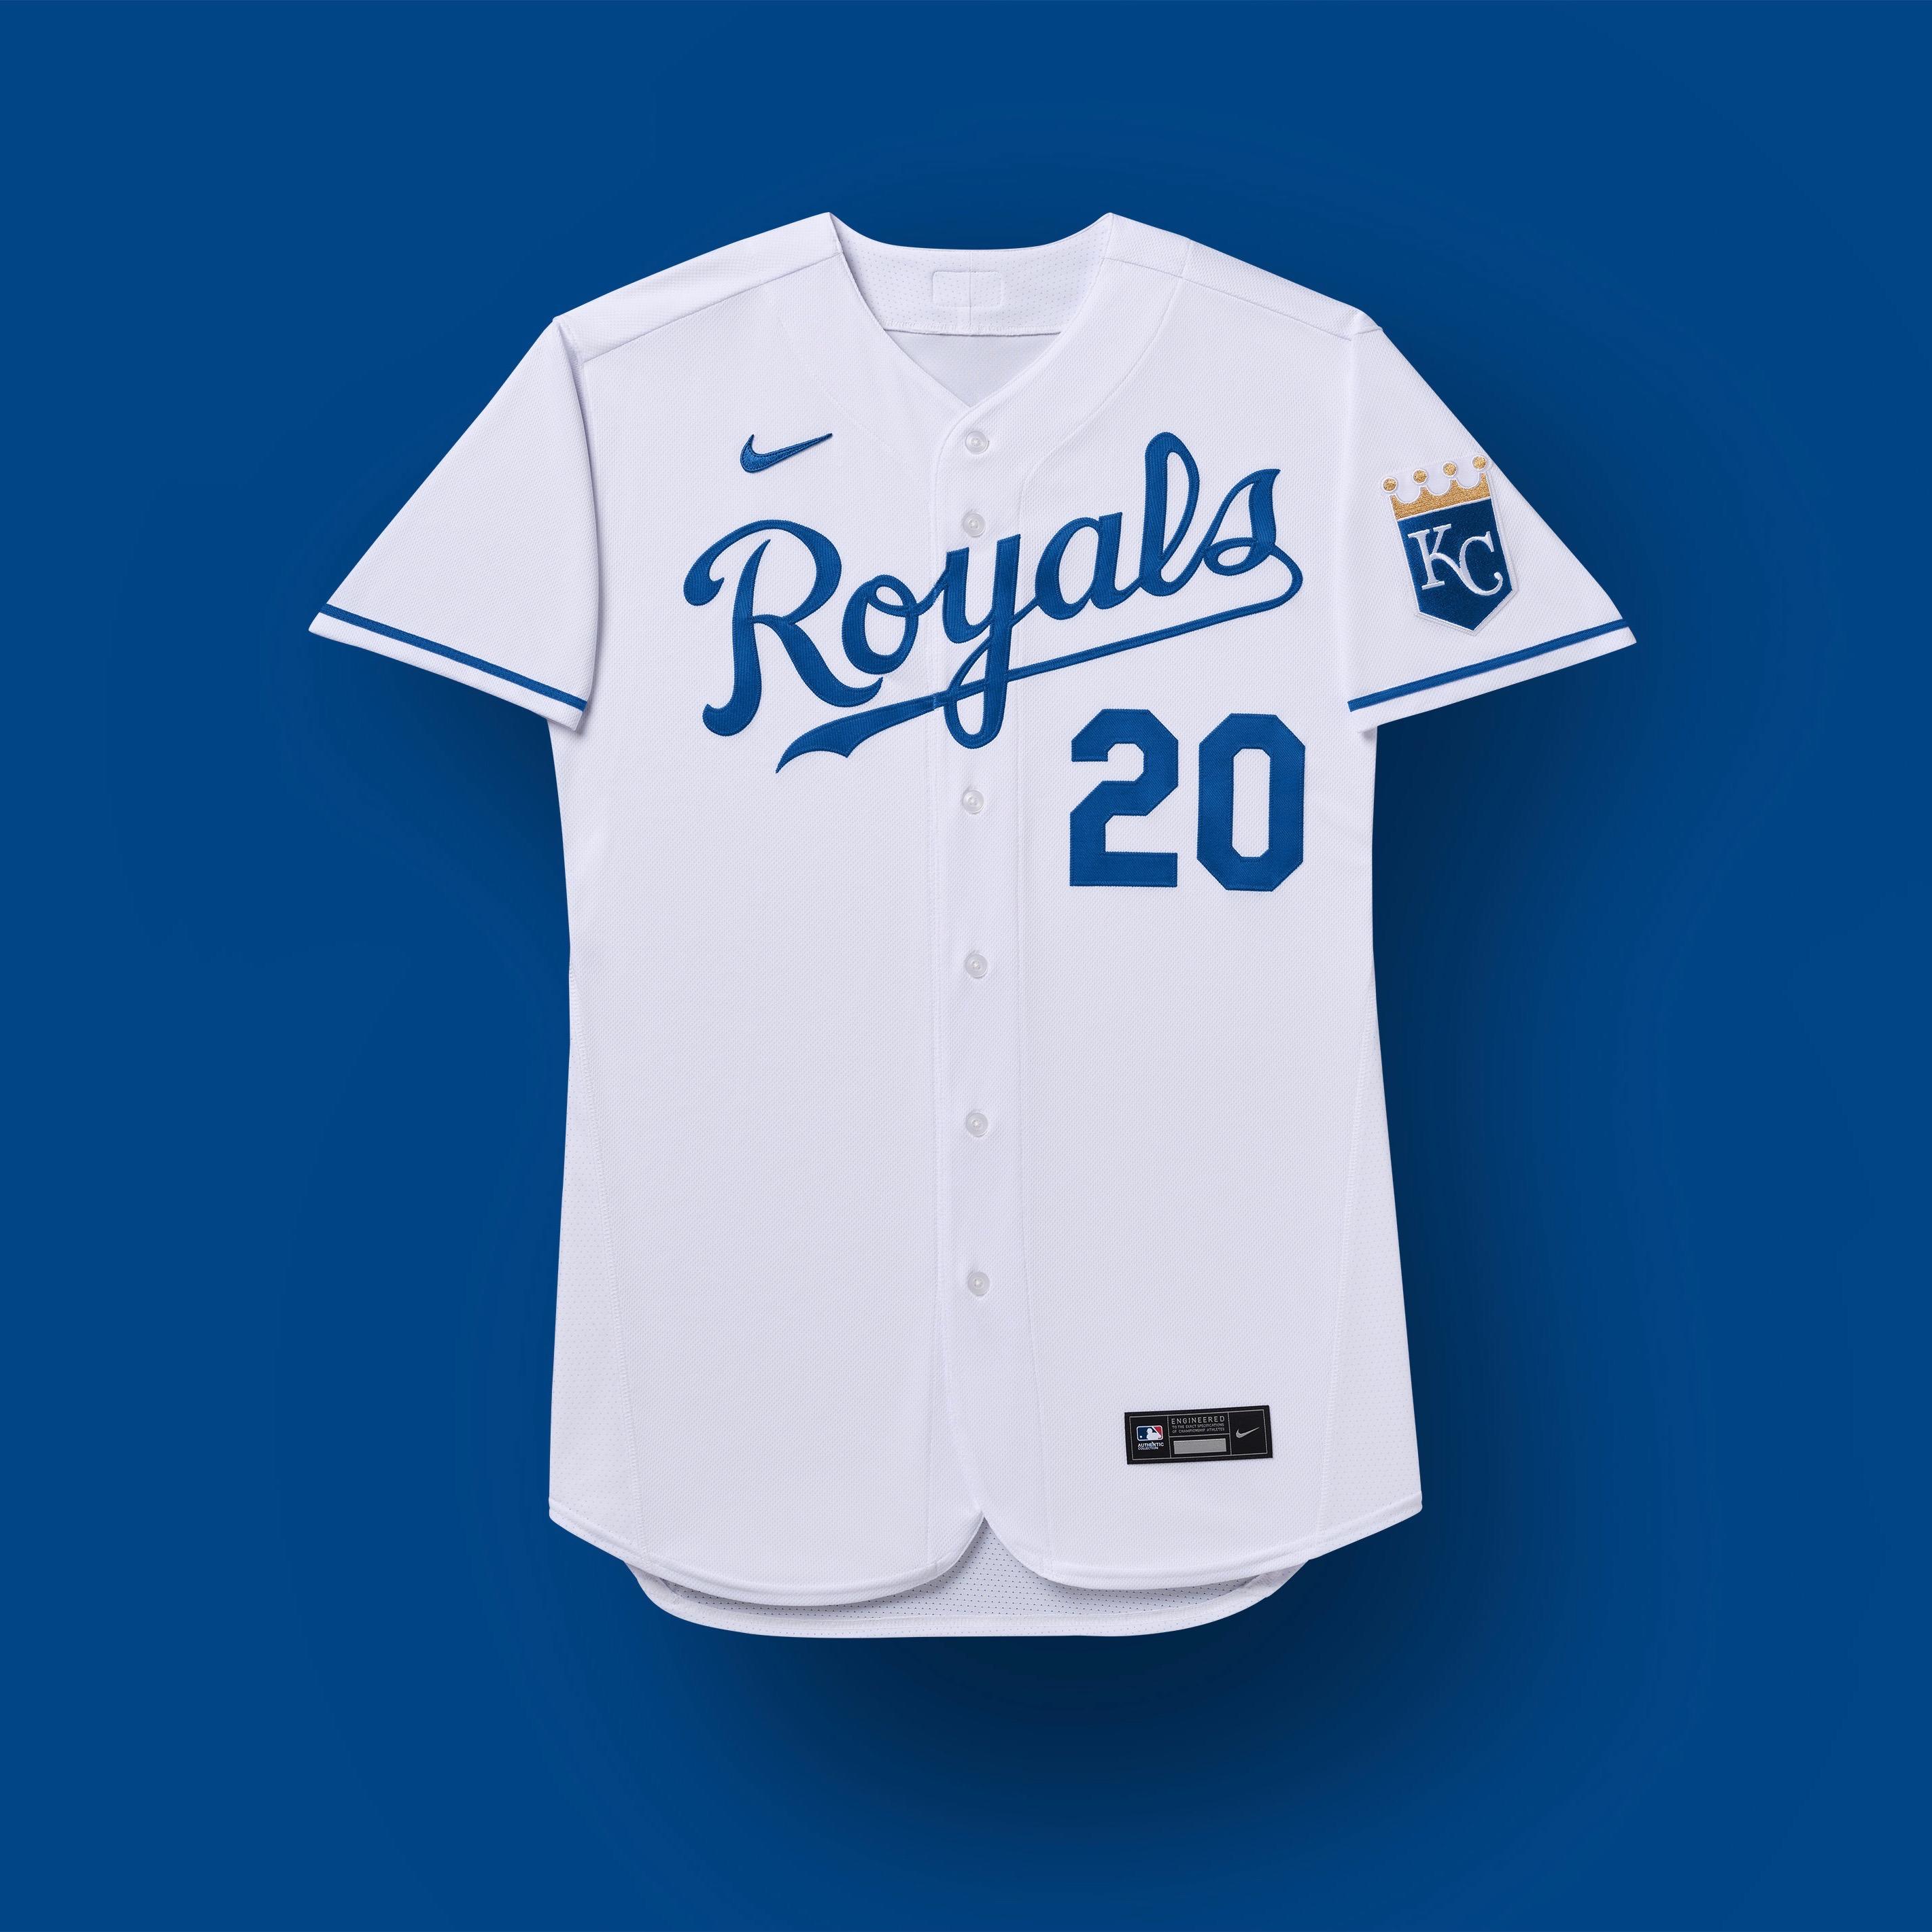 kansas city royals 2020 uniforms